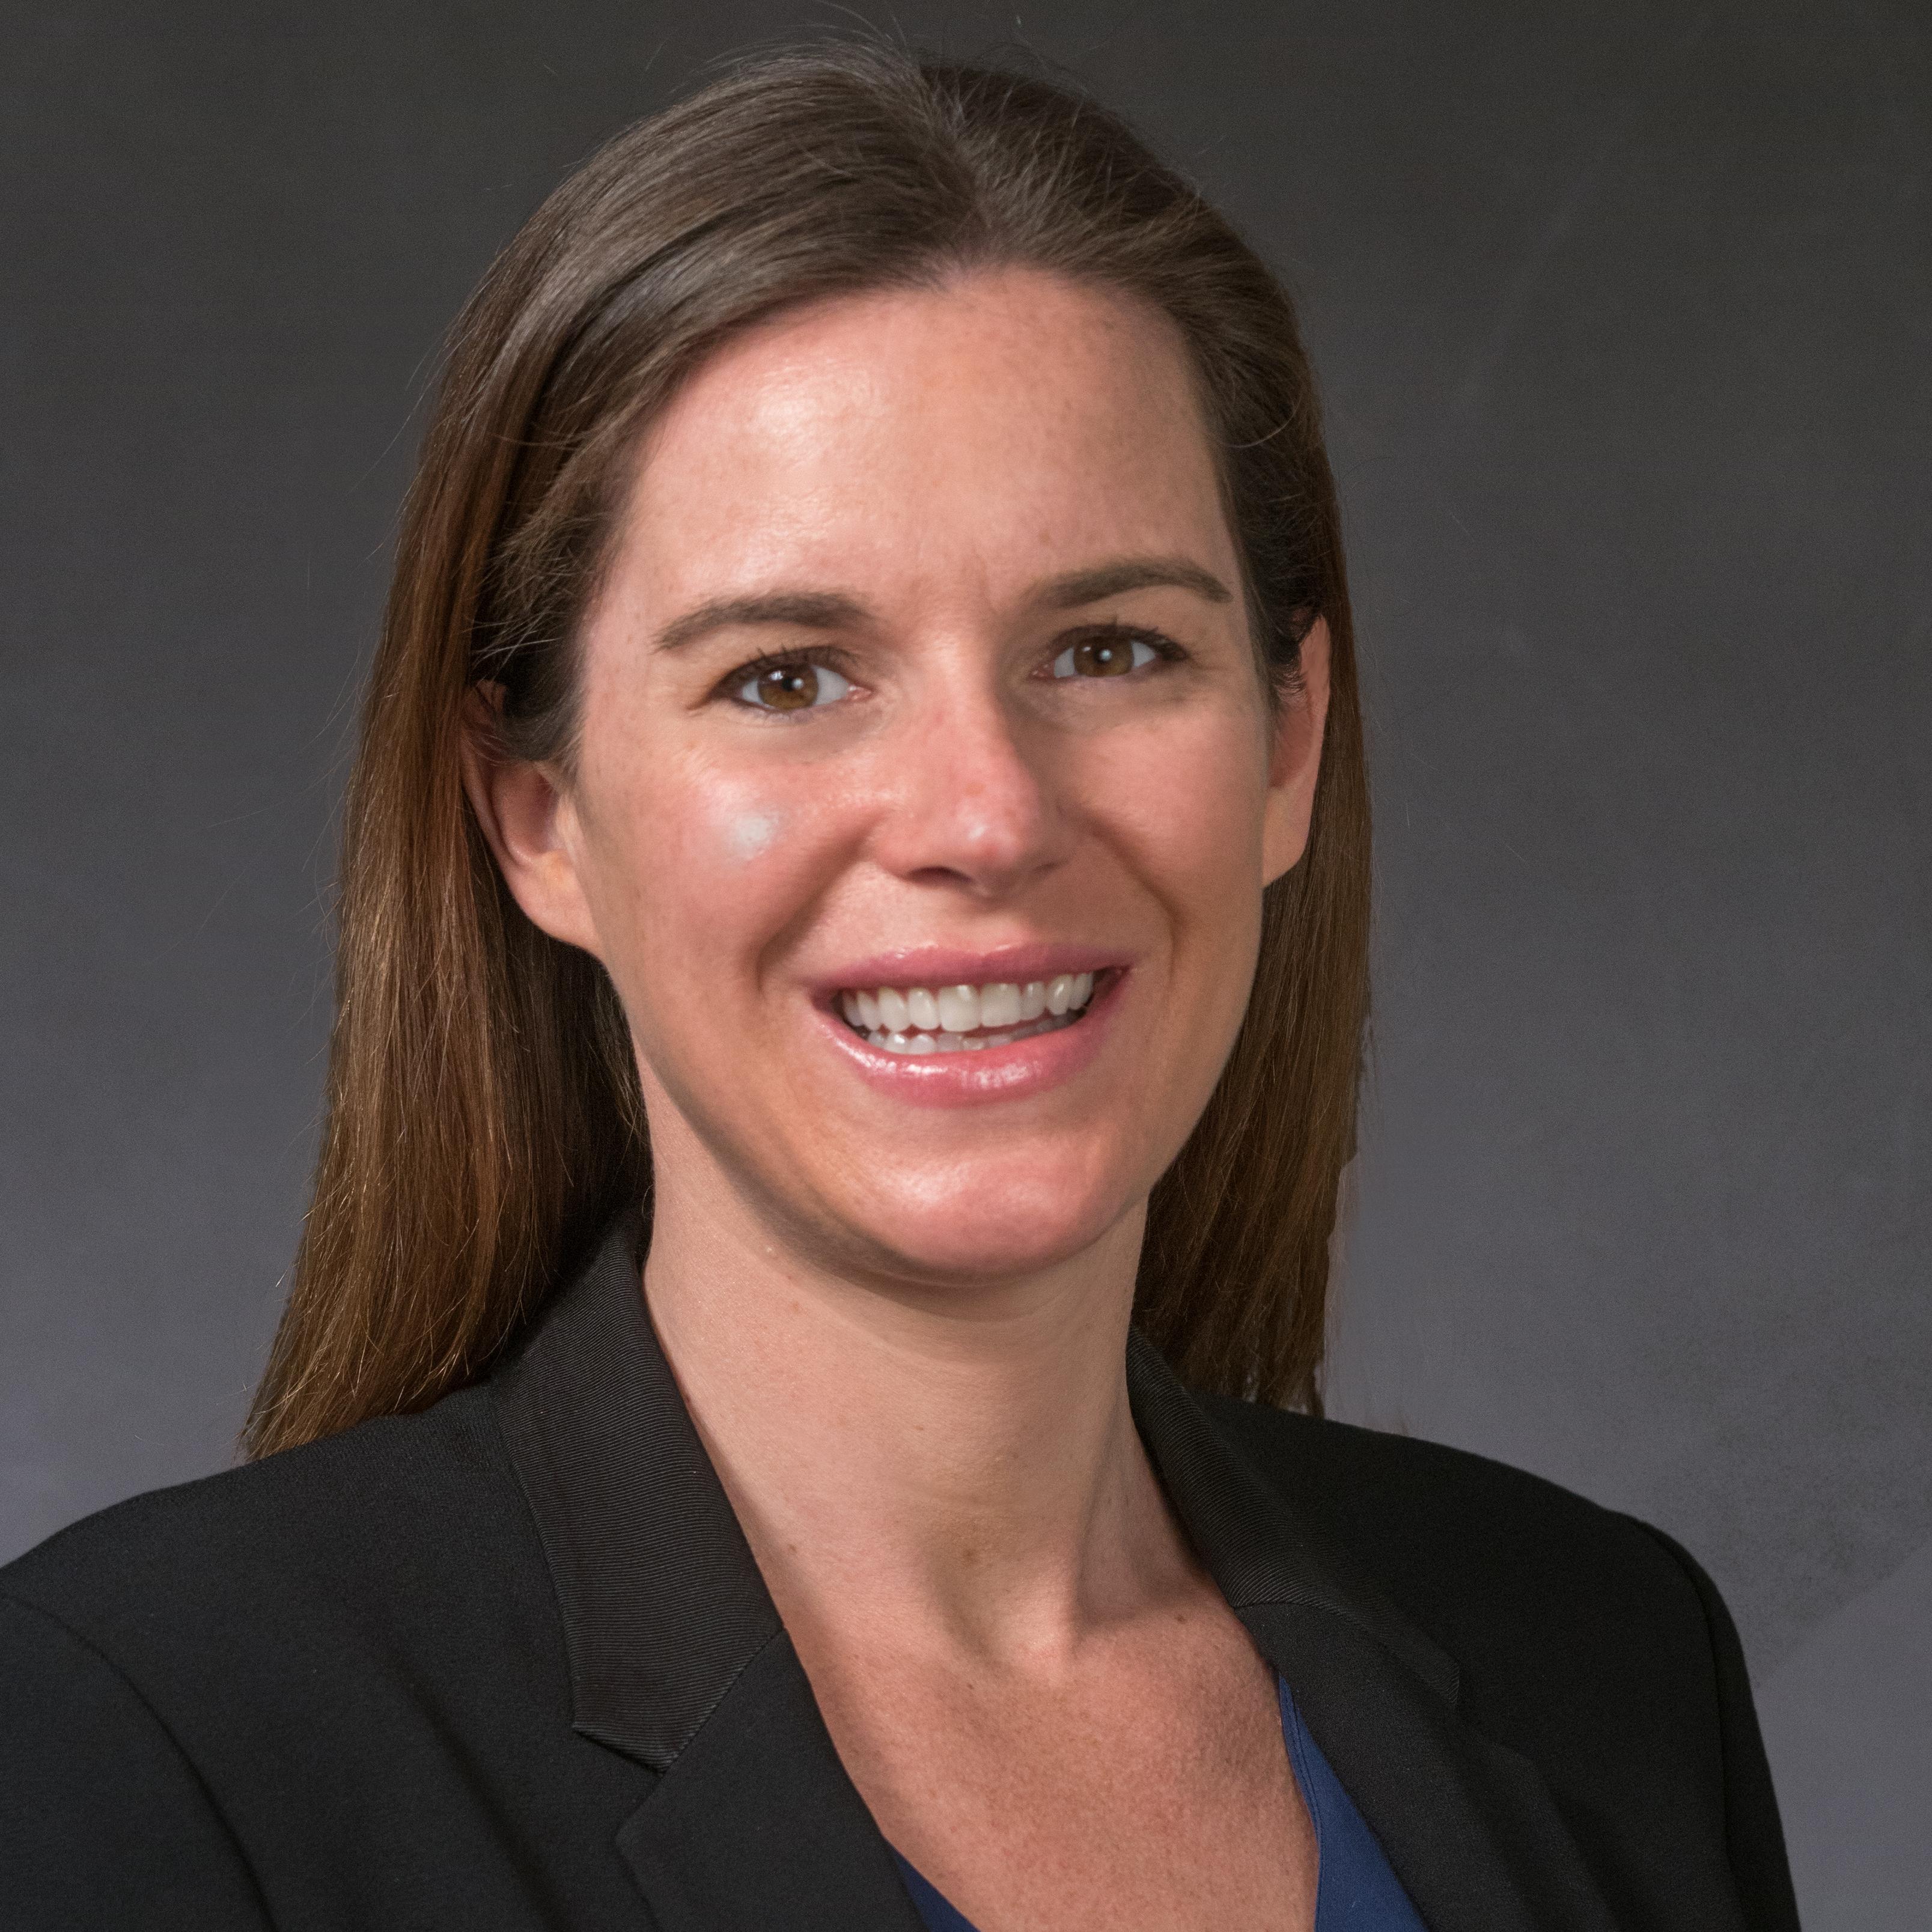 Dr. Eimile Dalton - Gastroenterologist - Austin Gastro